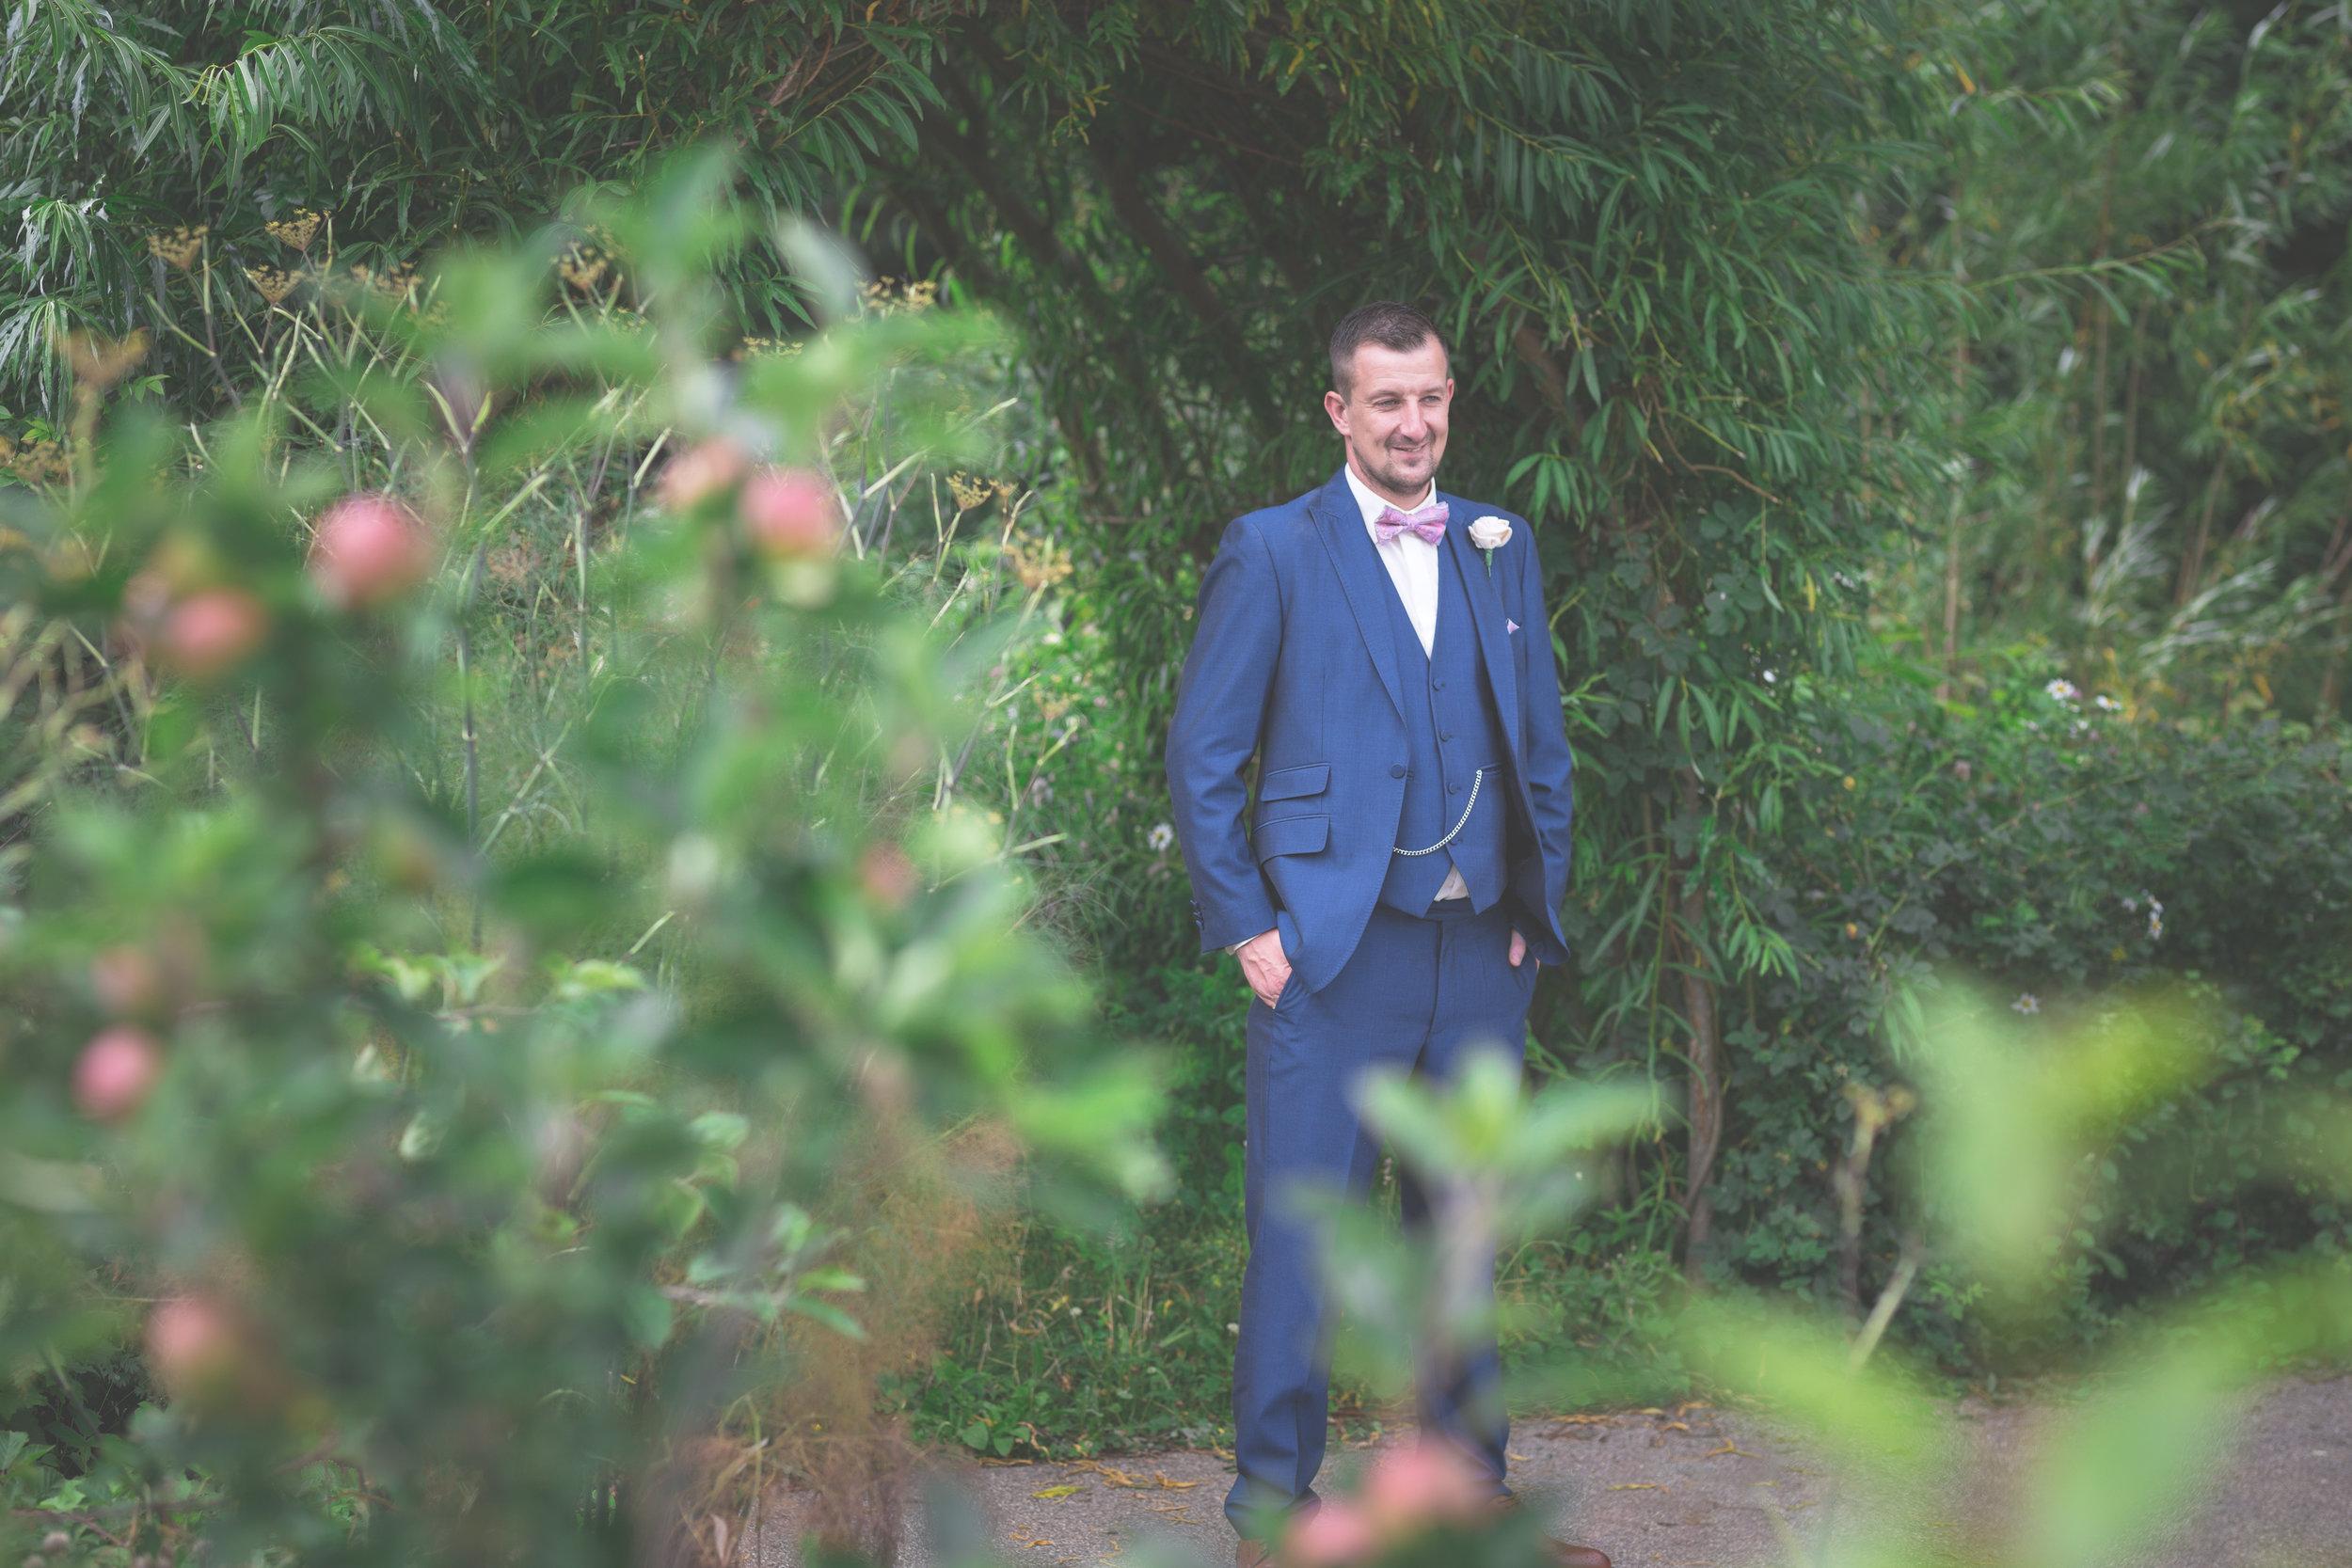 Antoinette & Stephen - Portraits   Brian McEwan Photography   Wedding Photographer Northern Ireland 14.jpg